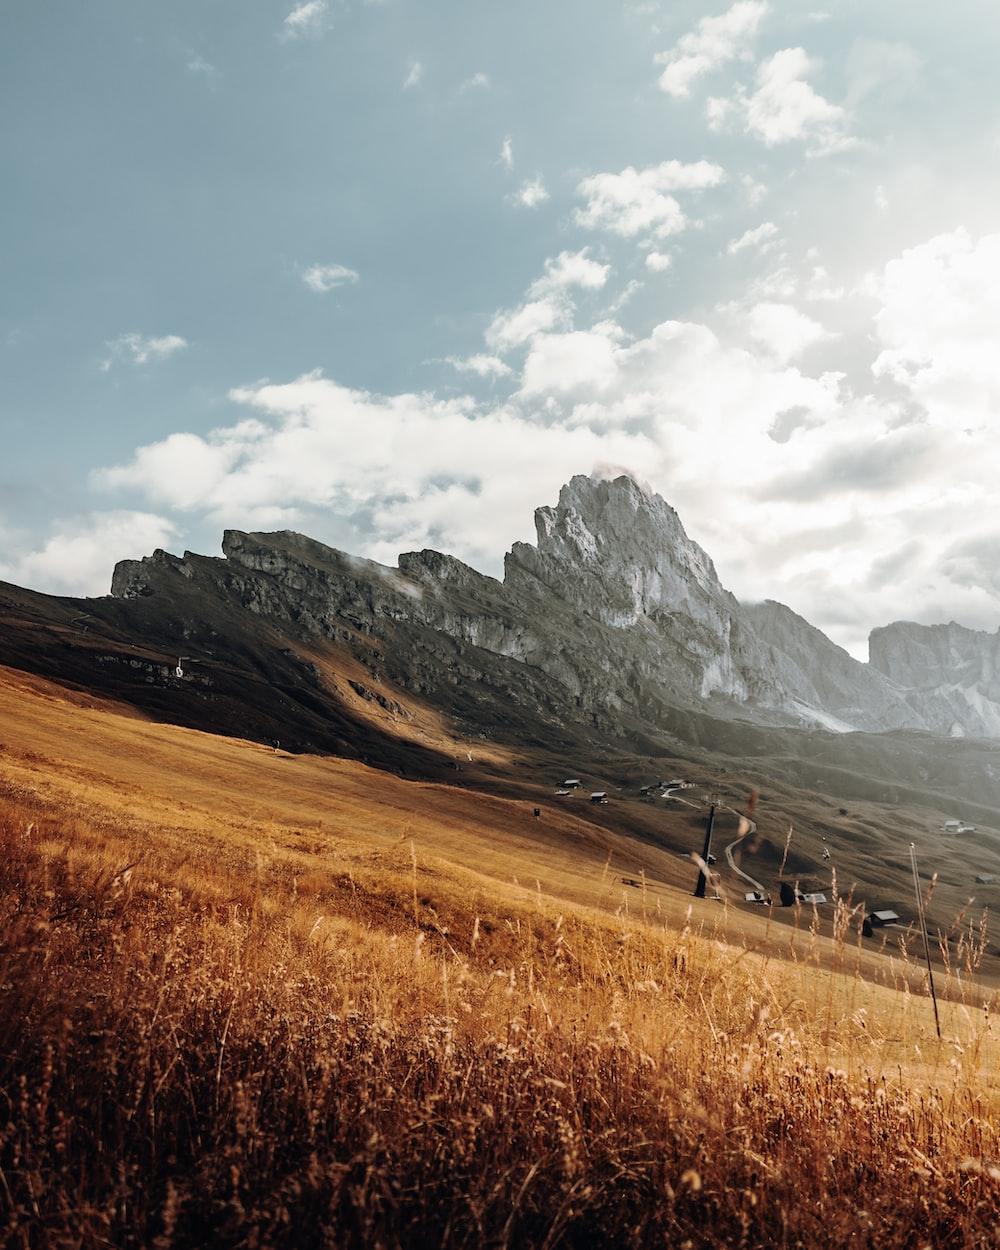 brown grass field near mountains under white clouds during daytime